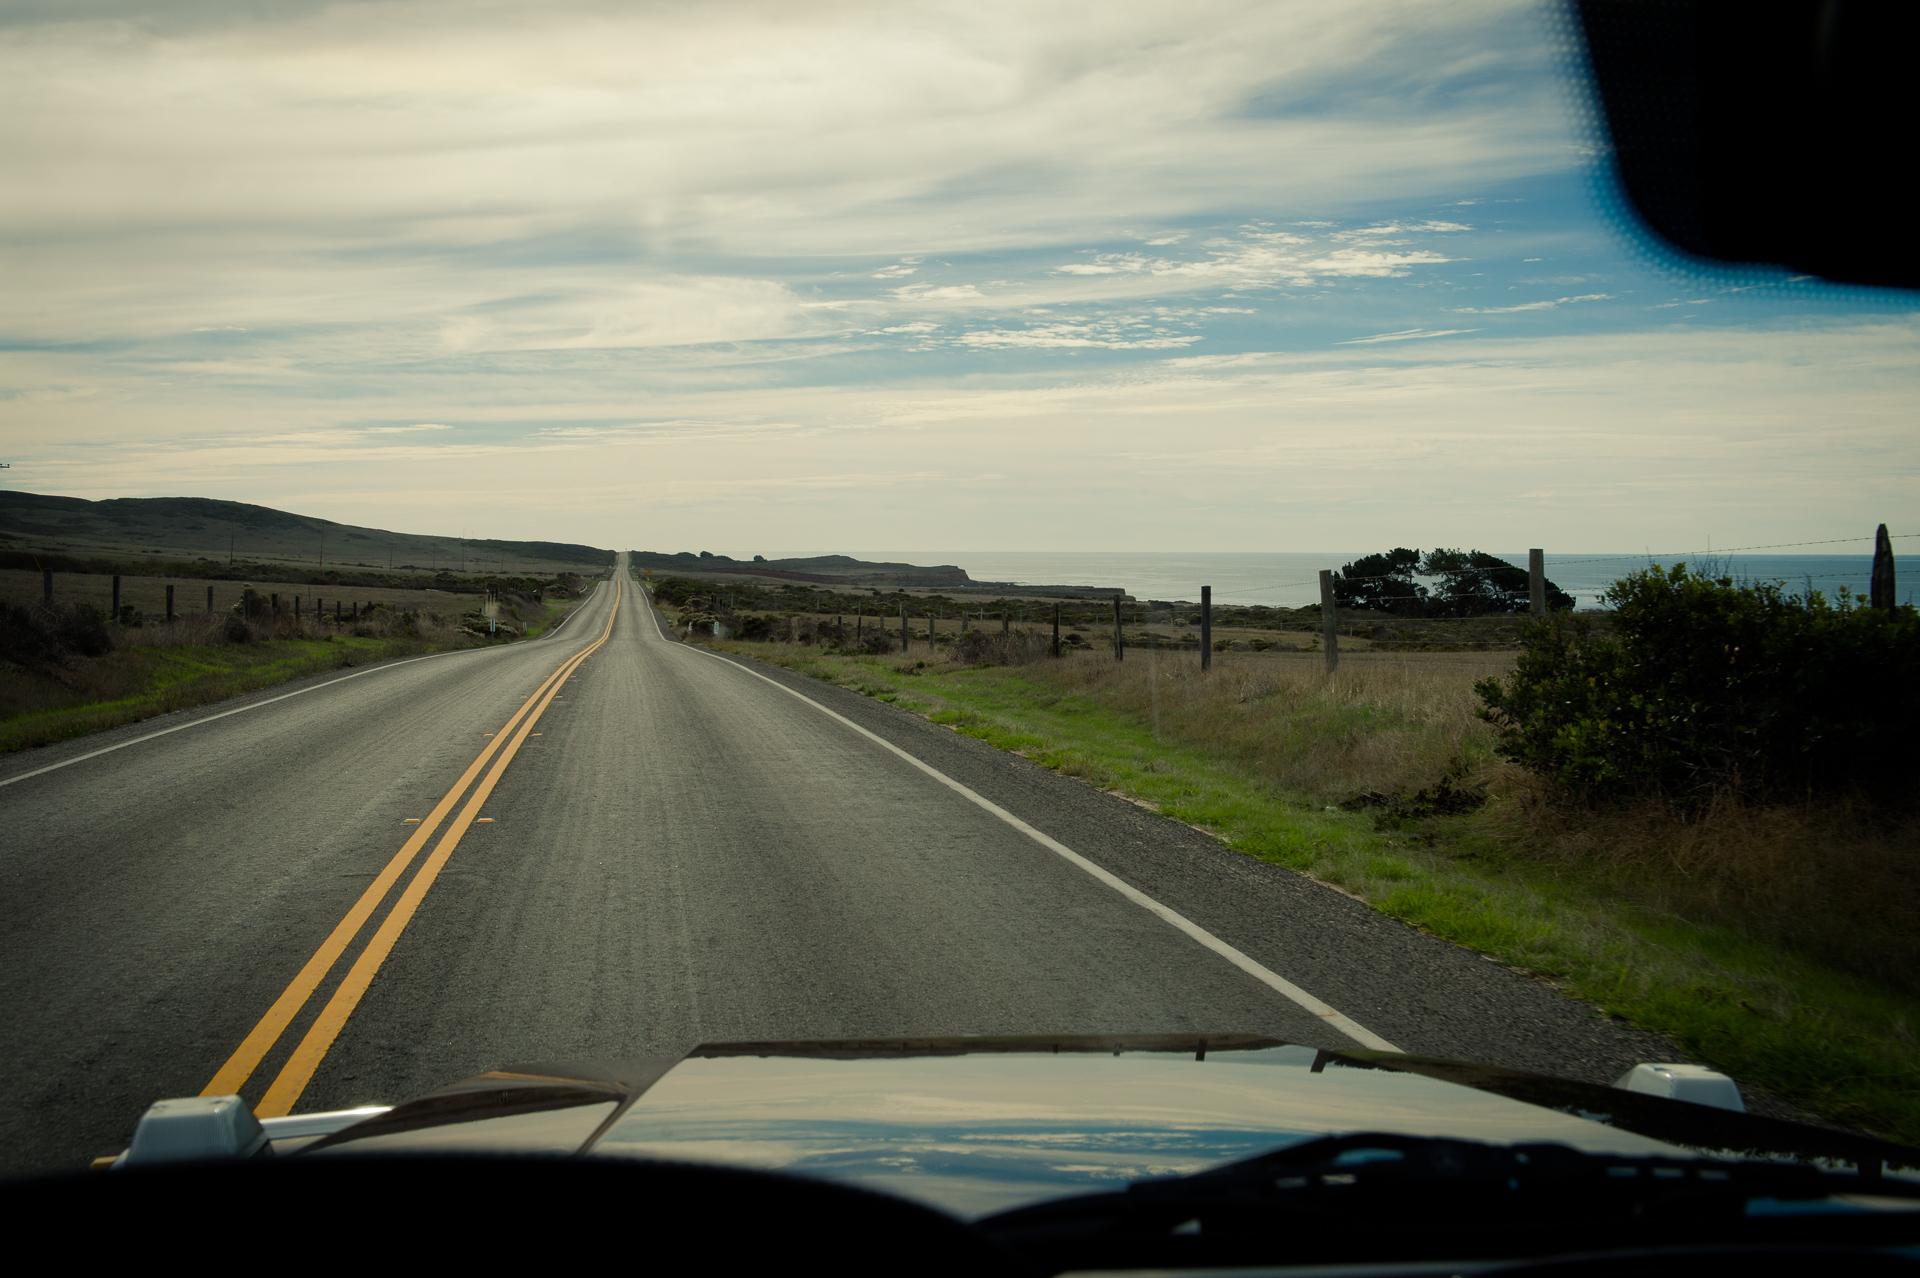 2014-Mercedes-Benz-G500-G550-braun-Kalifornien-mbrt14-06